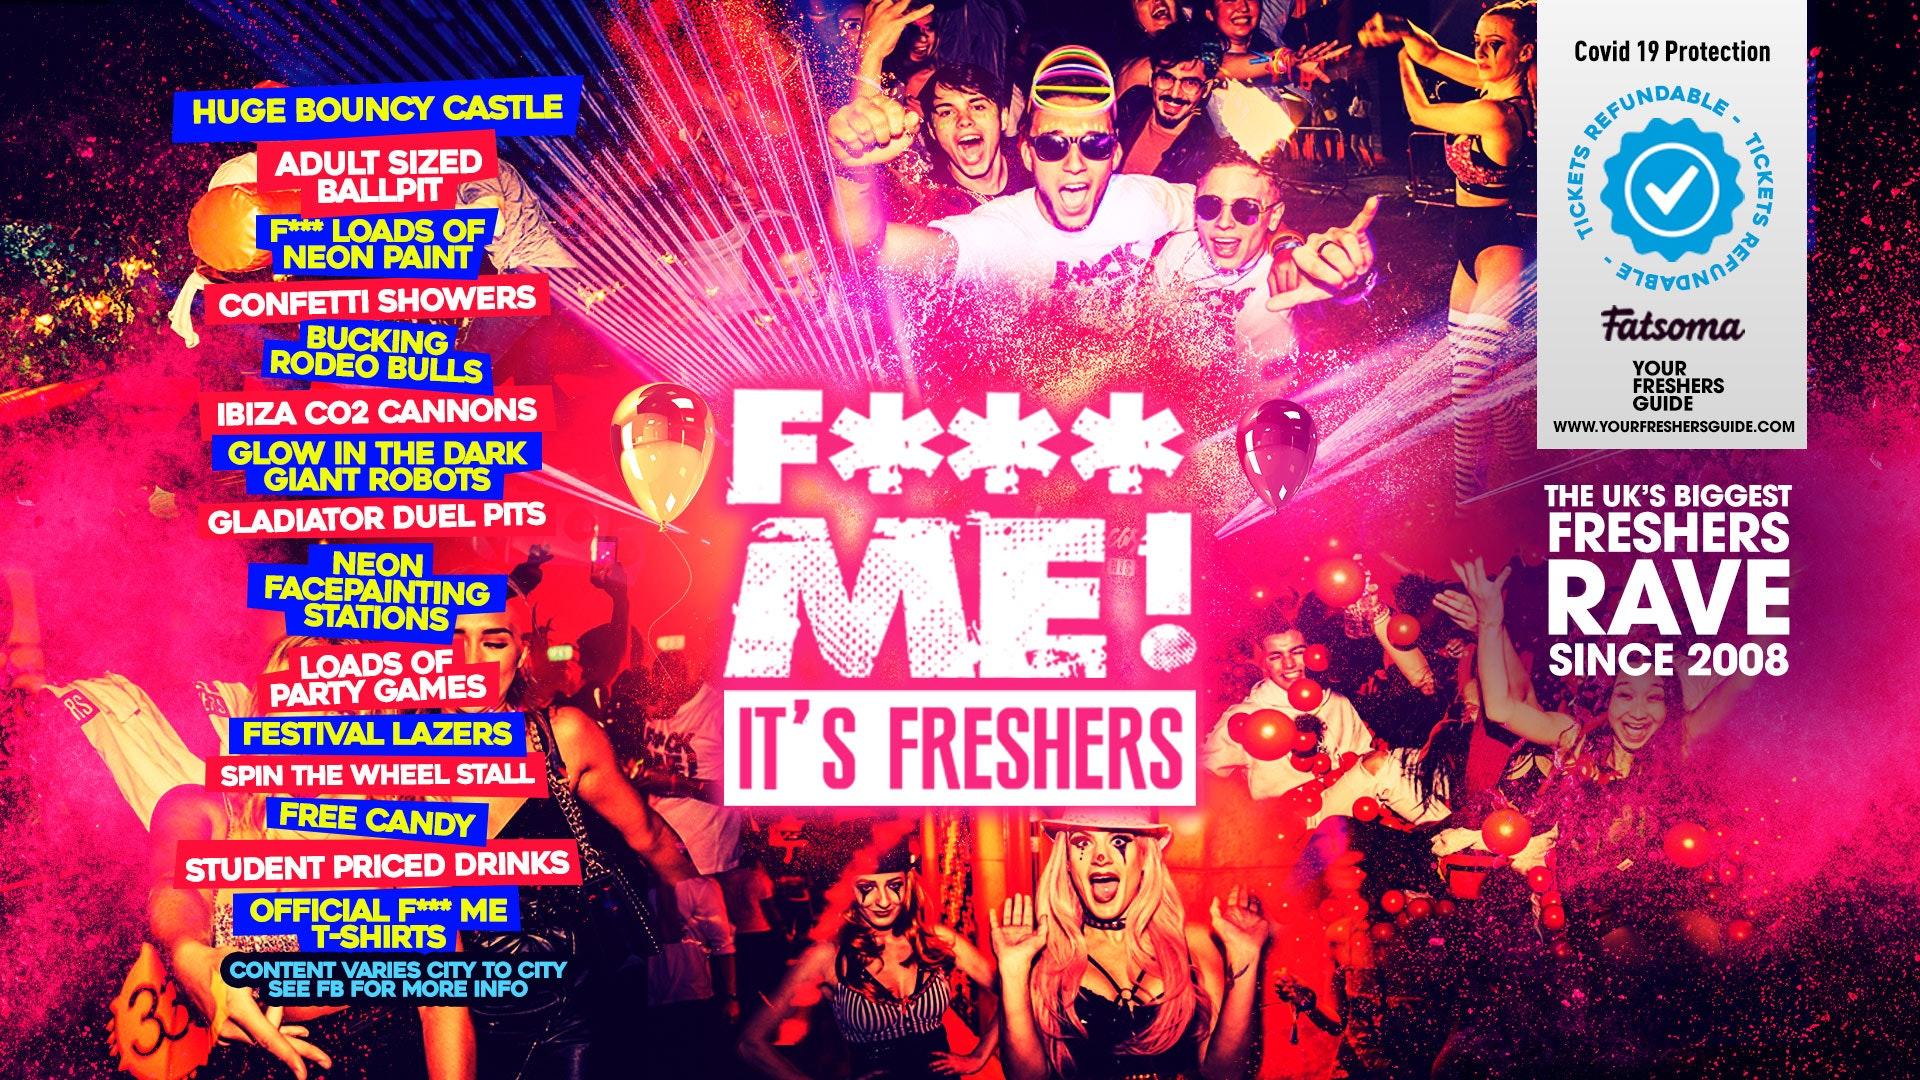 FME It's Freshers // Leeds Freshers 2020